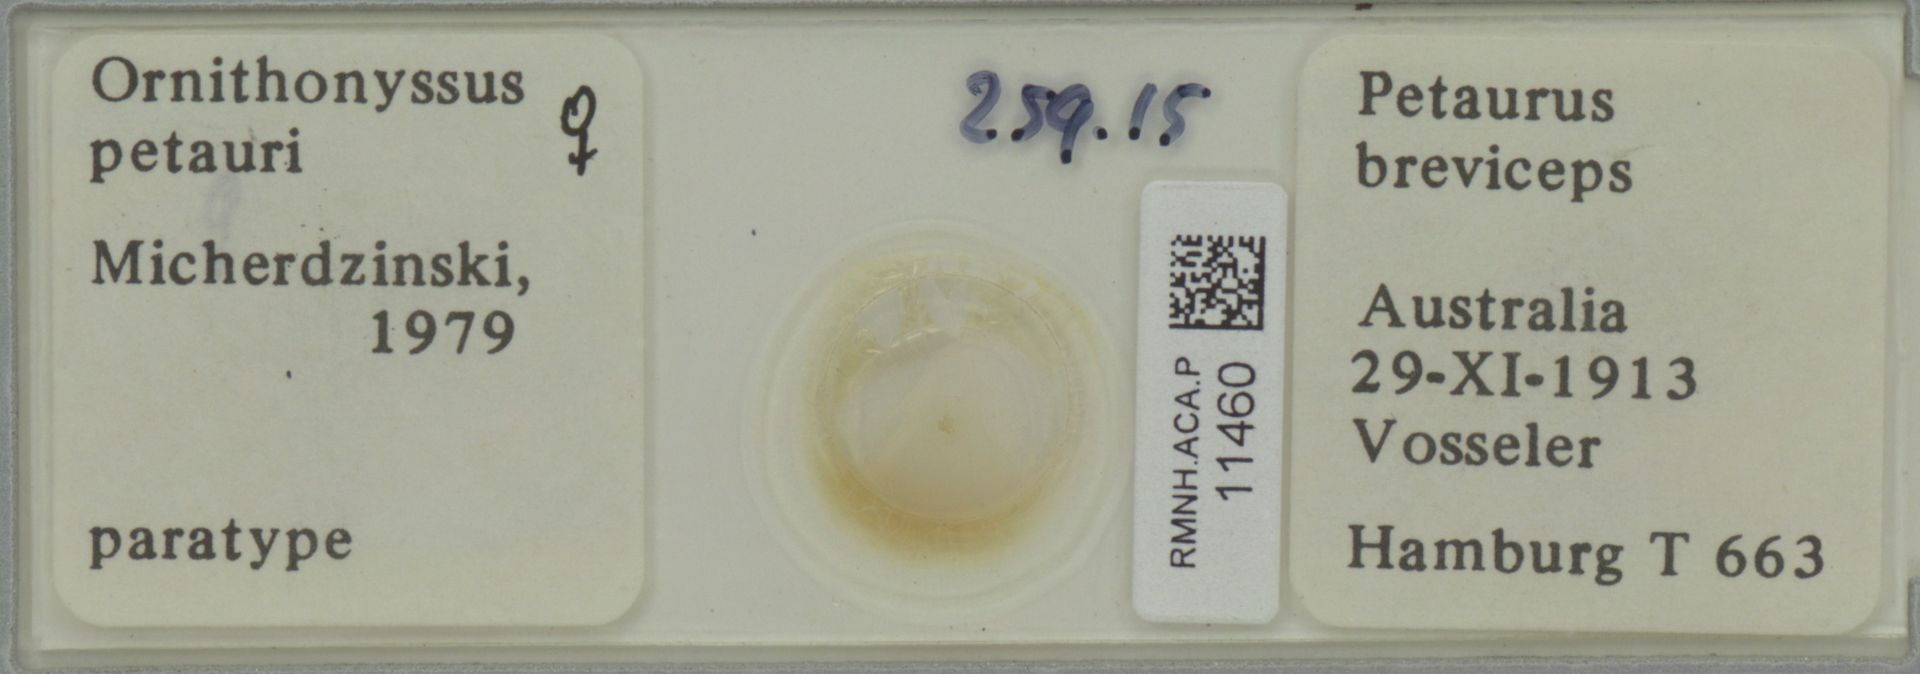 RMNH.ACA.P.11460 | Ornithonyssus petauri Micherdzinski, 1979